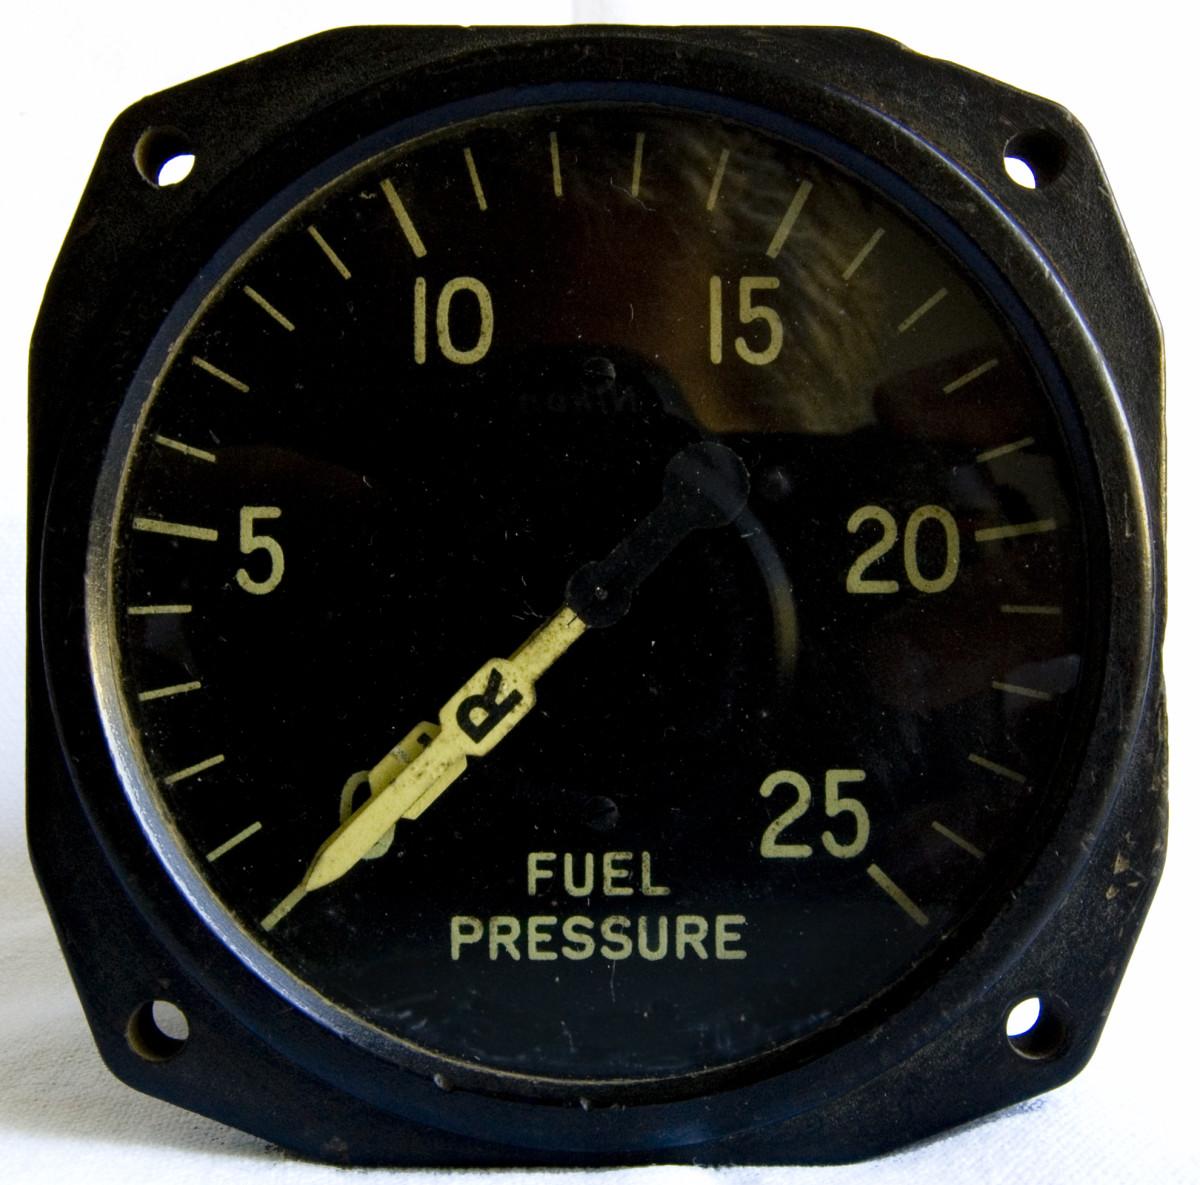 Fuel pressure gauge.